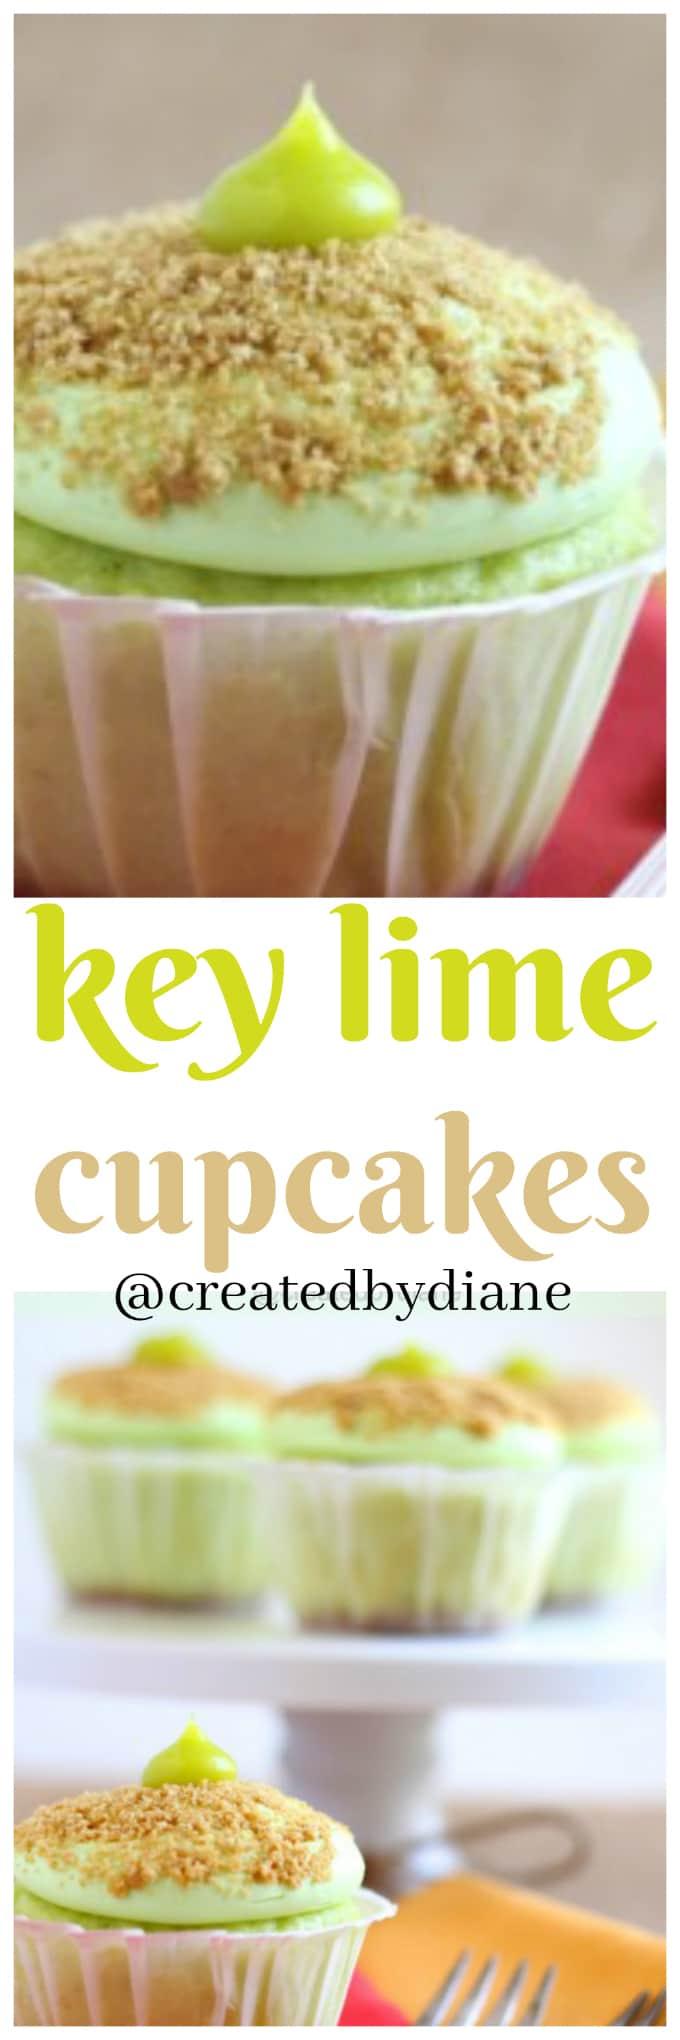 key lime cupcakes @createdbydiane